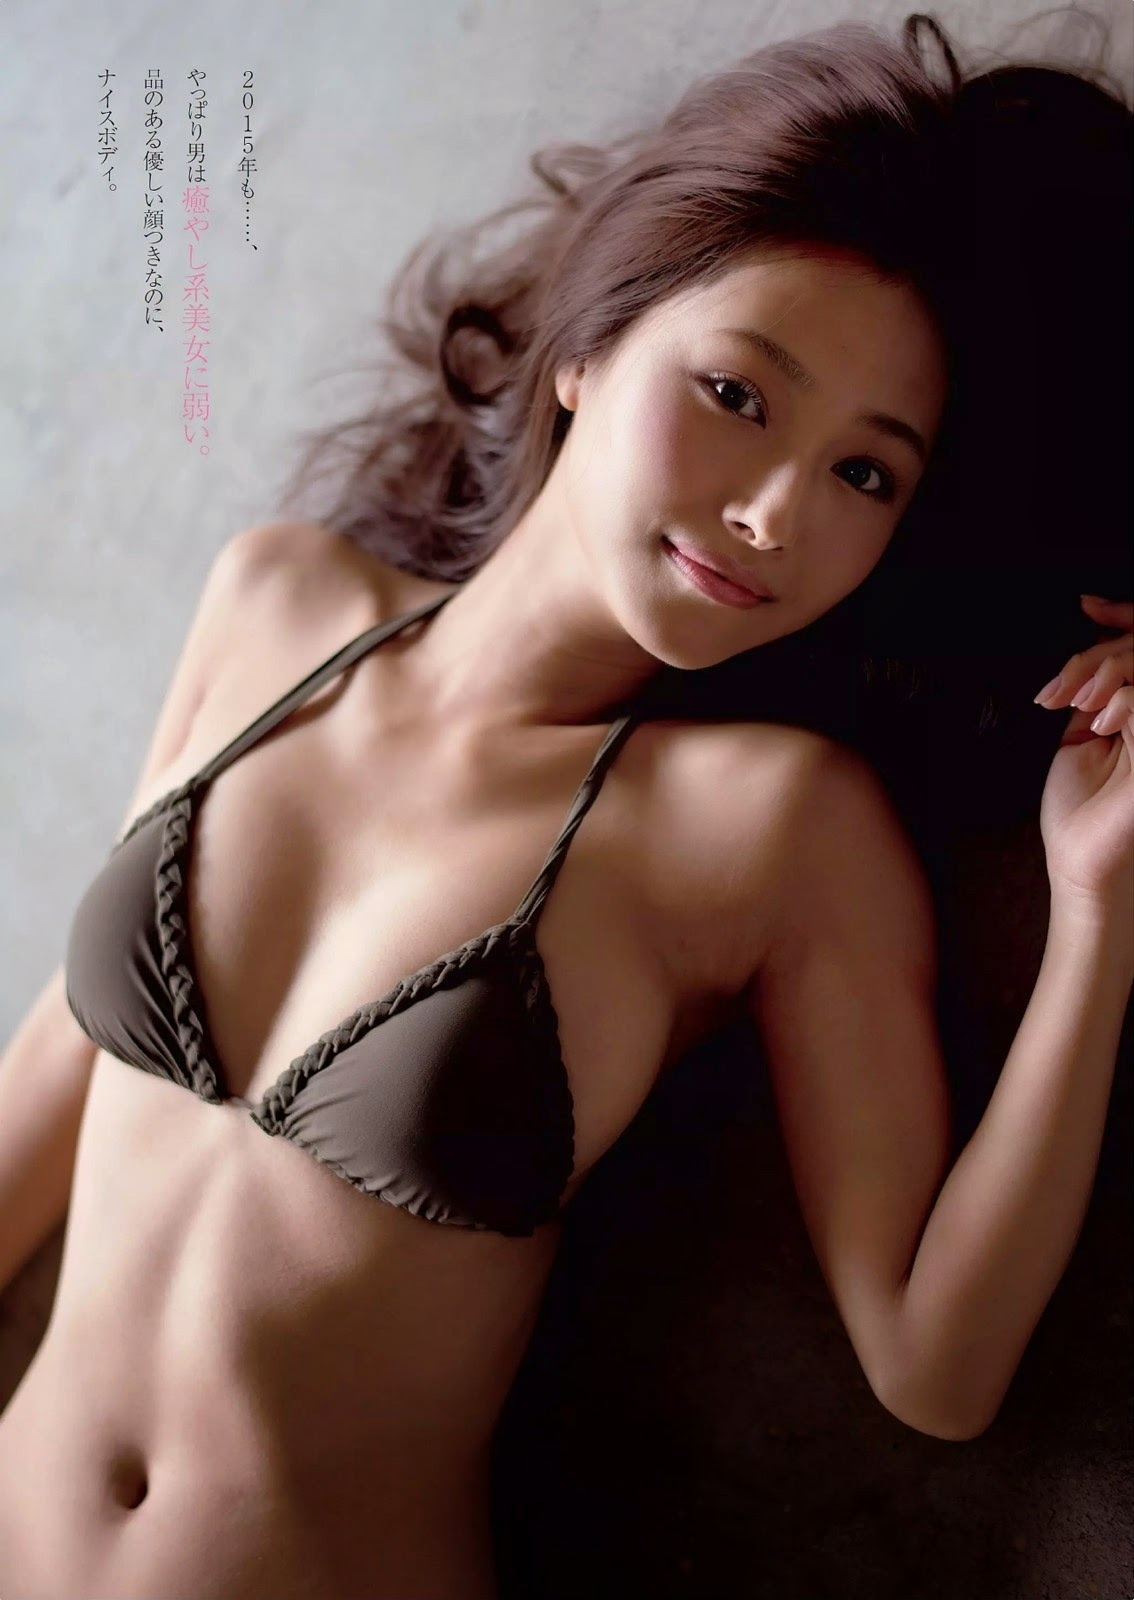 Ishikawa Risako 石川理咲子 Weekly Playboy No 5 2015 Photos 4